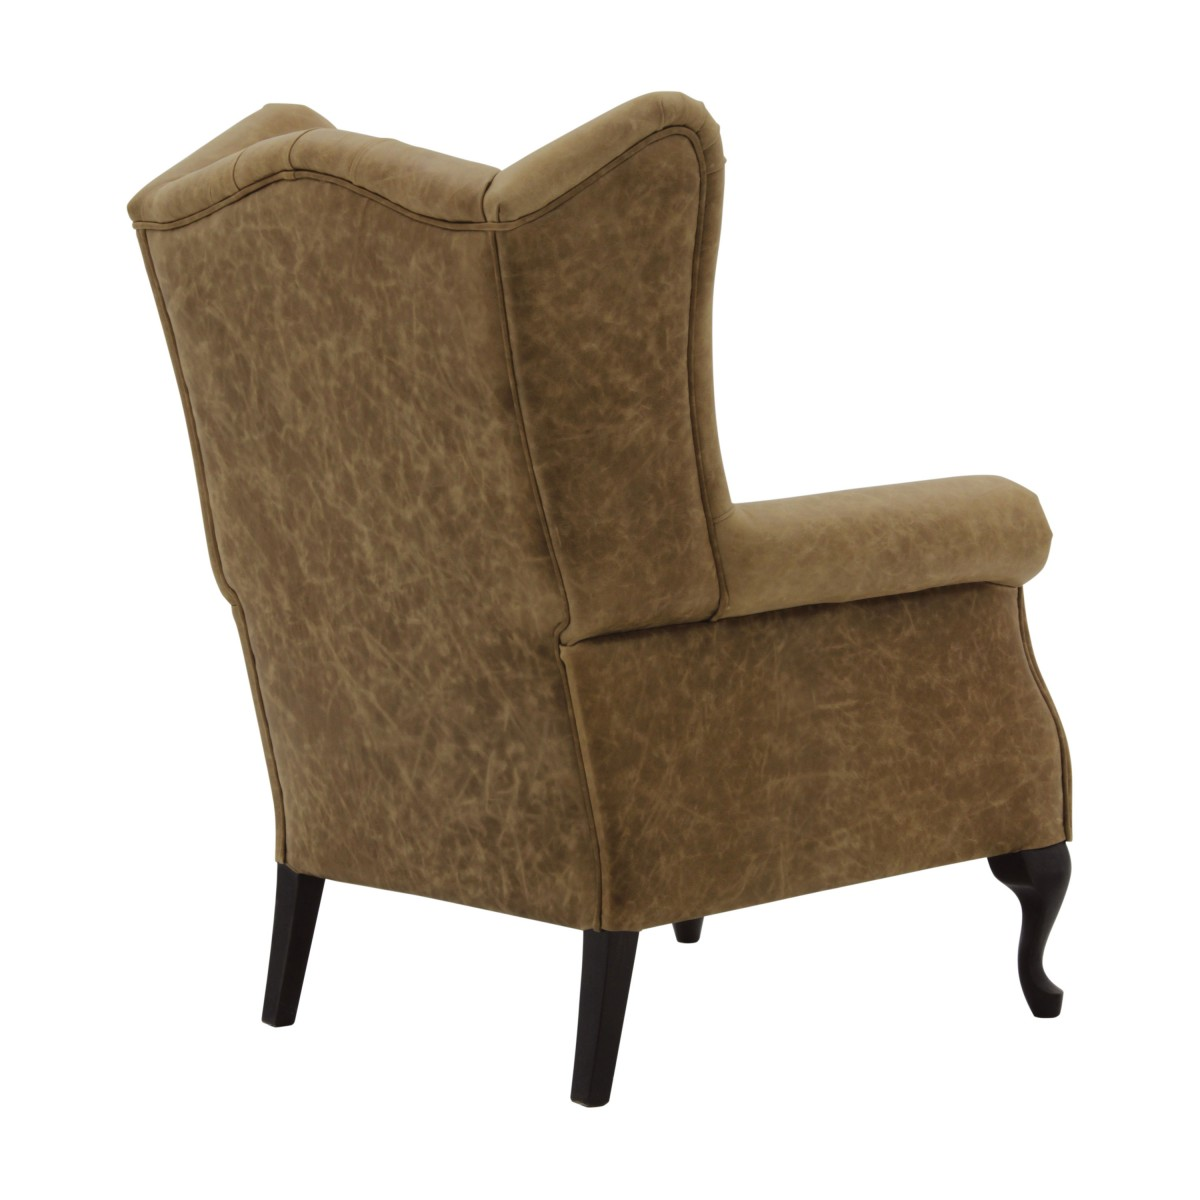 classic armchair old england 2 3870